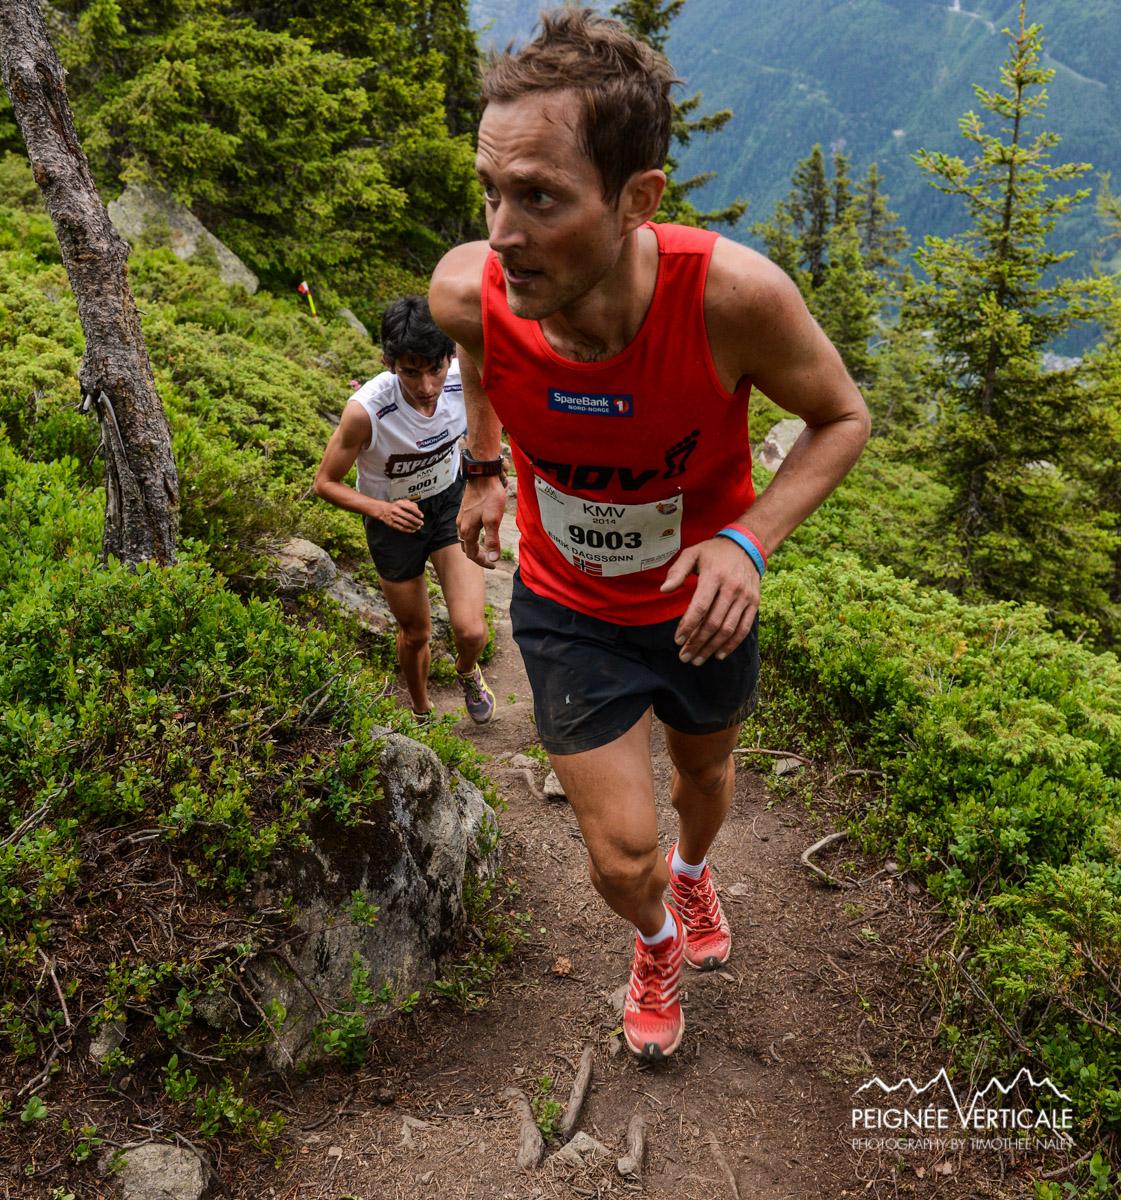 Km-vertical-Chamonix-Skyrunning-2014-Timothee-Nalet-3364.jpg